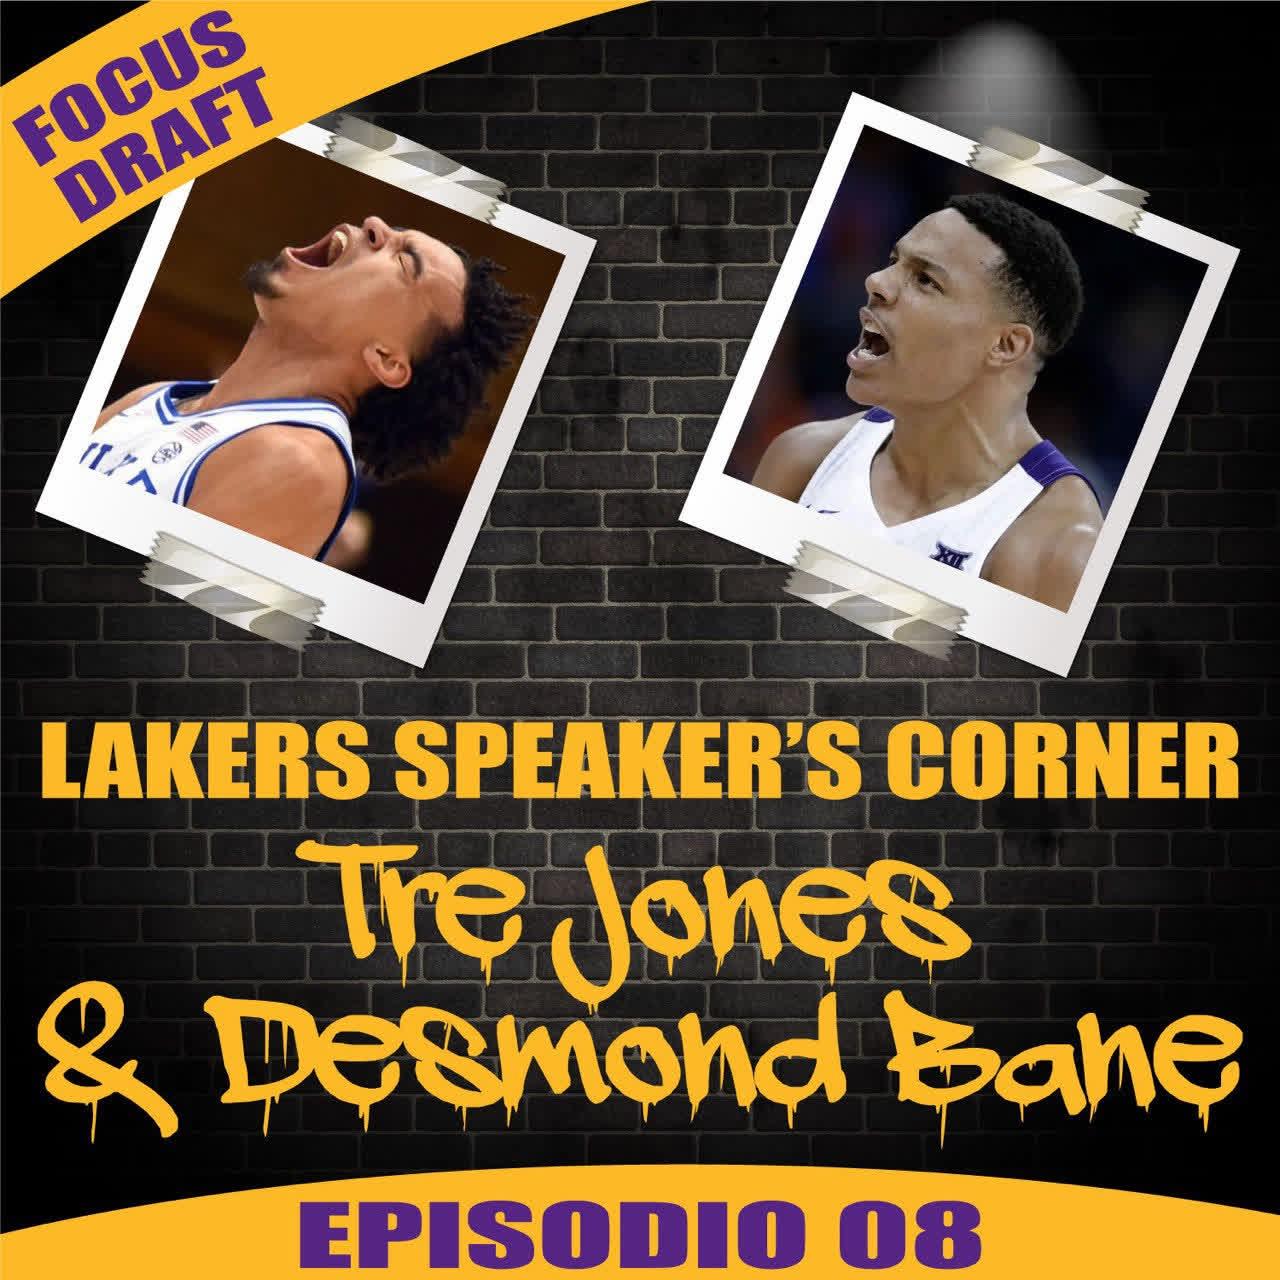 LSC Focus Draft 08: Tre Jones & Desmond Bane